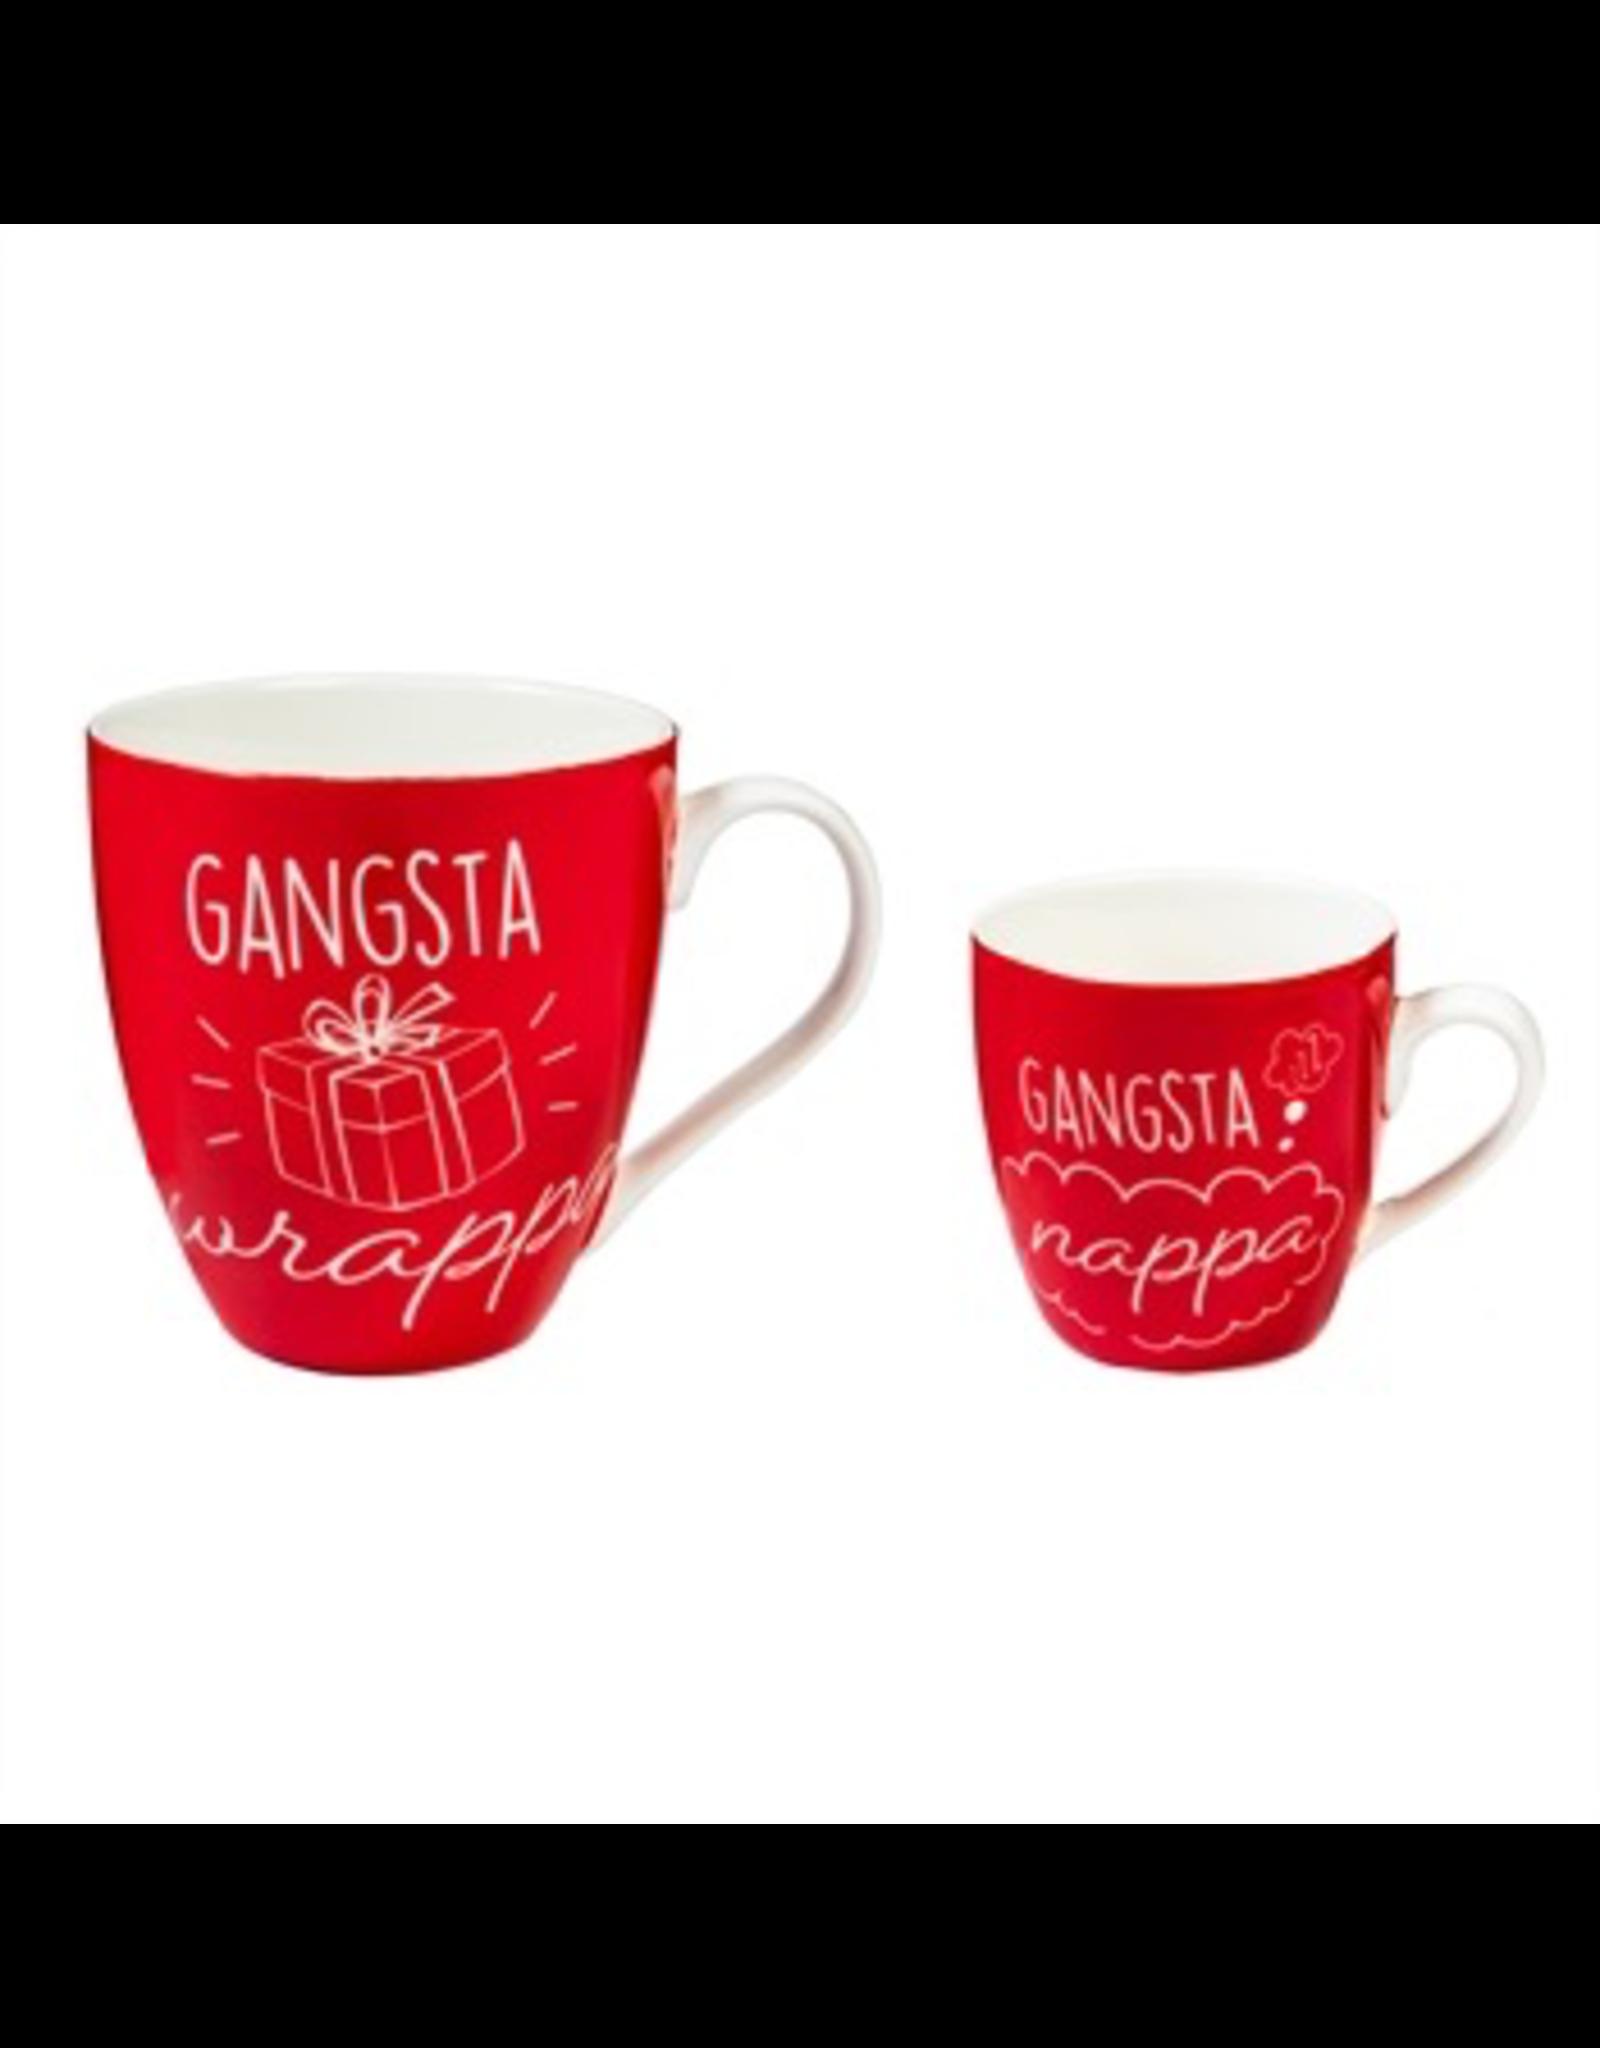 Evergreen Enterprises Gangsta Wrappa and Gangsta Nappa